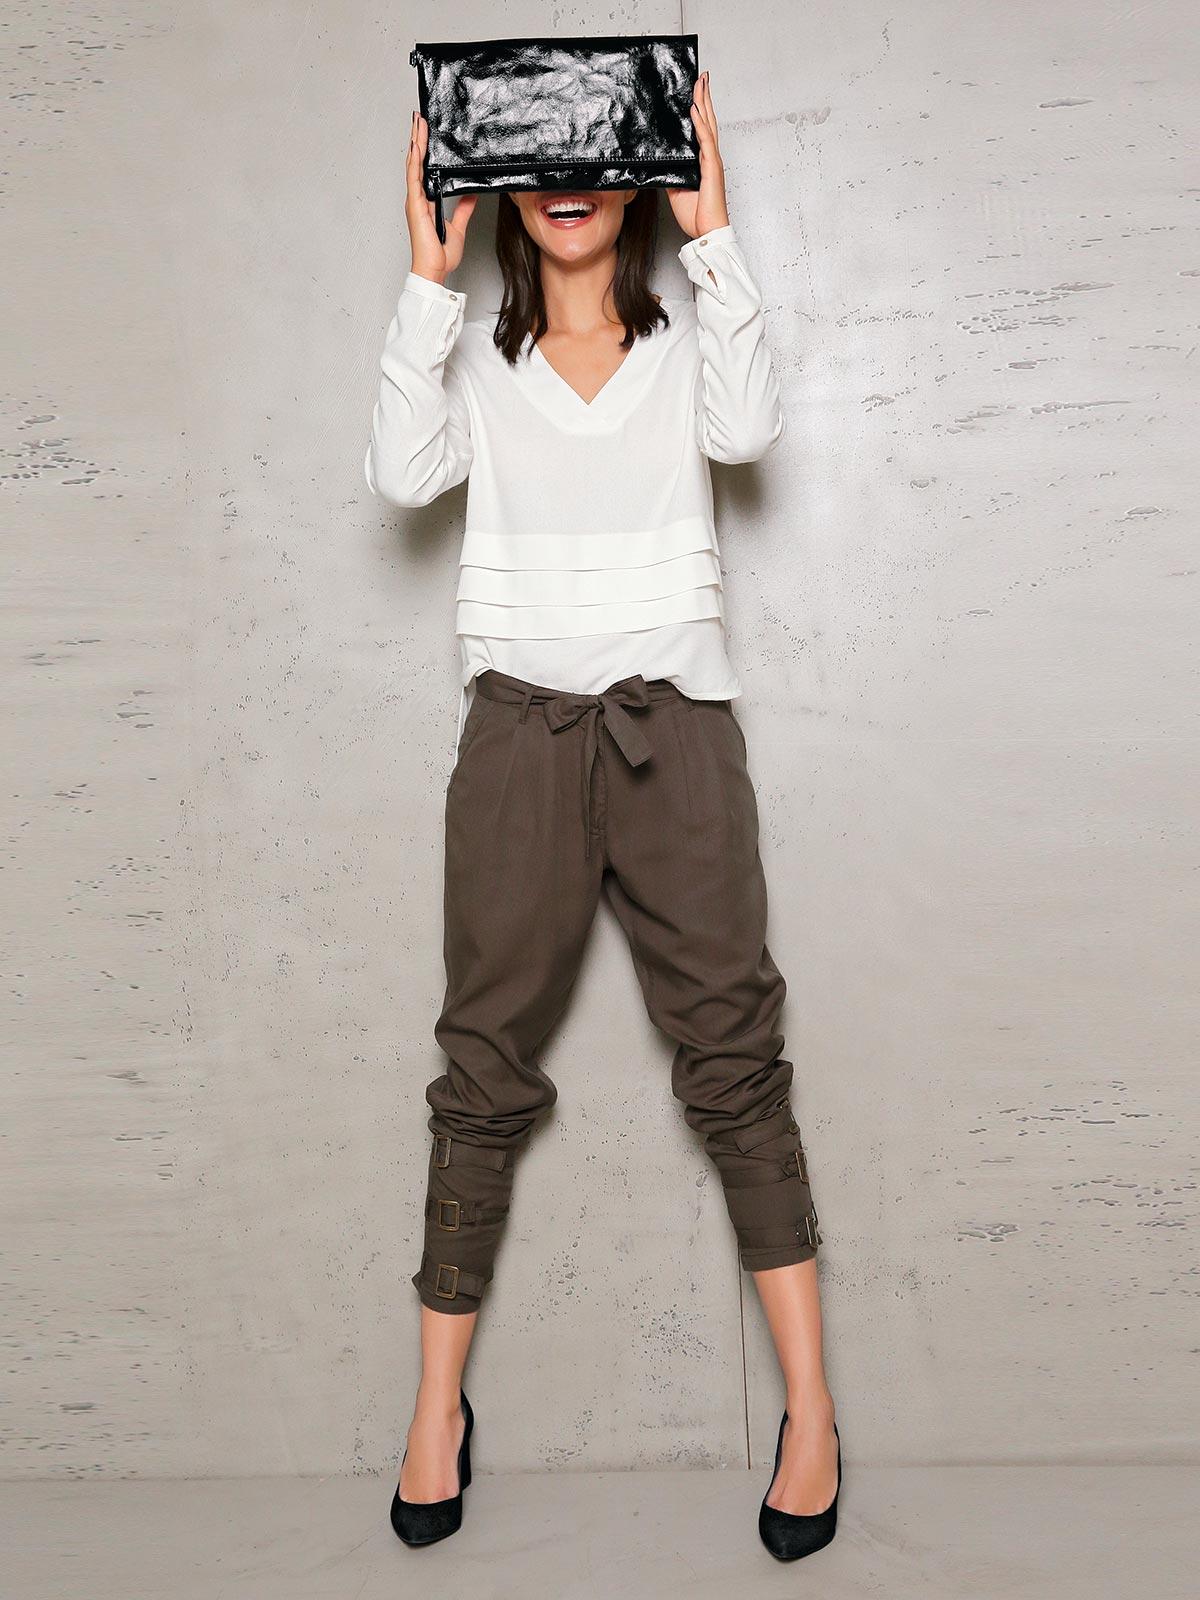 Safari-Hose in der Trendfarbe Khaki